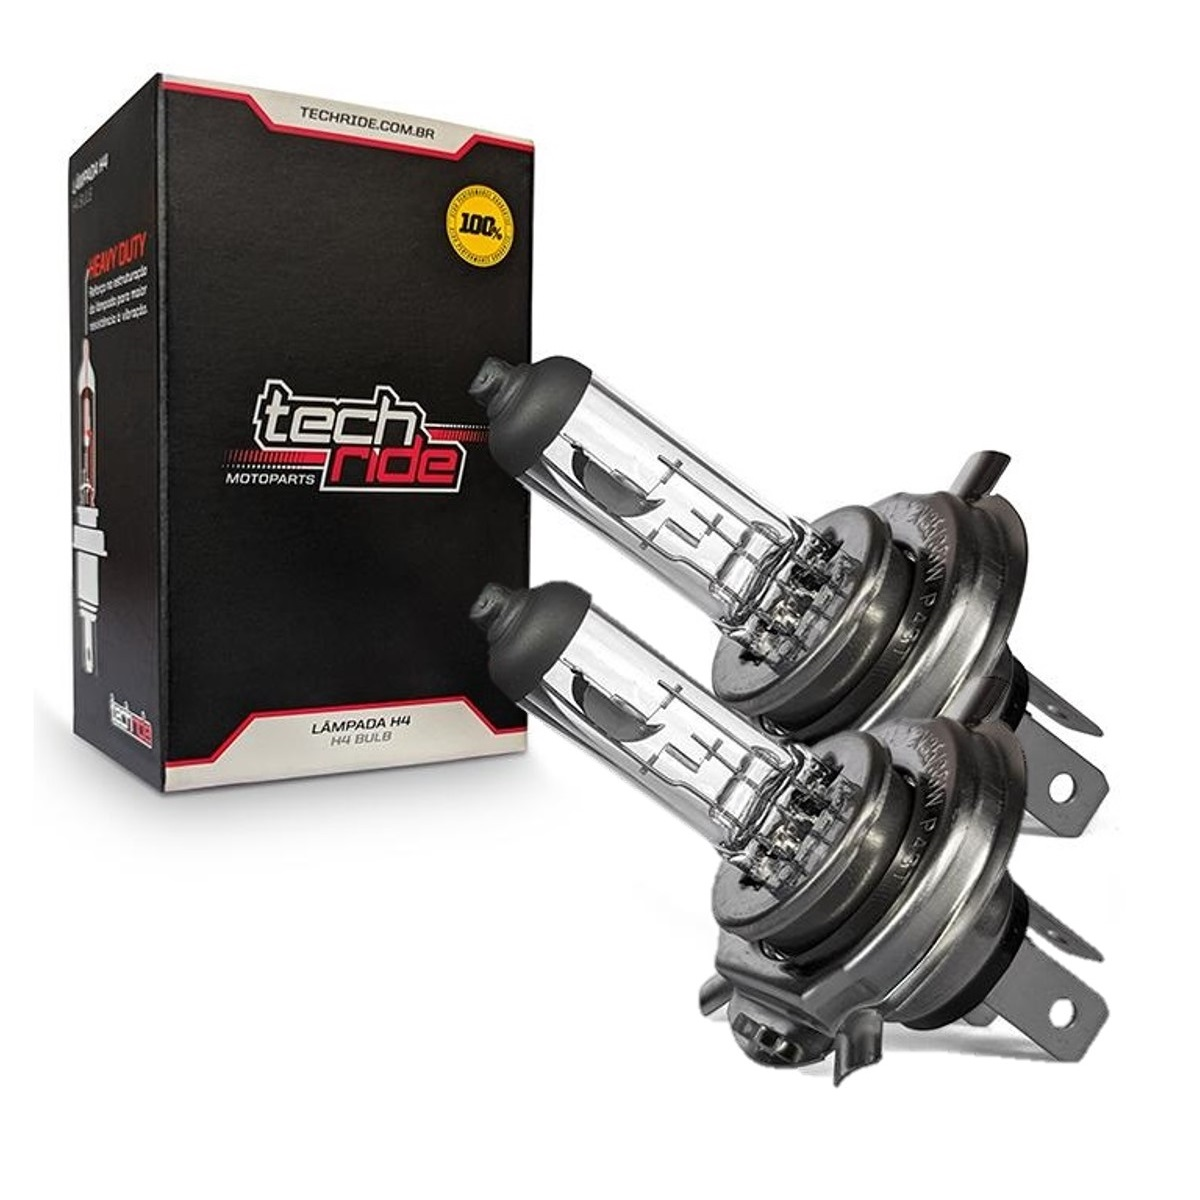 Lâmpada Farol H4 12V 60/55W Falcon NX400 / CB Twister 250F 2016 / Next 250 / CB500 Reforçada Tech Ride 2un